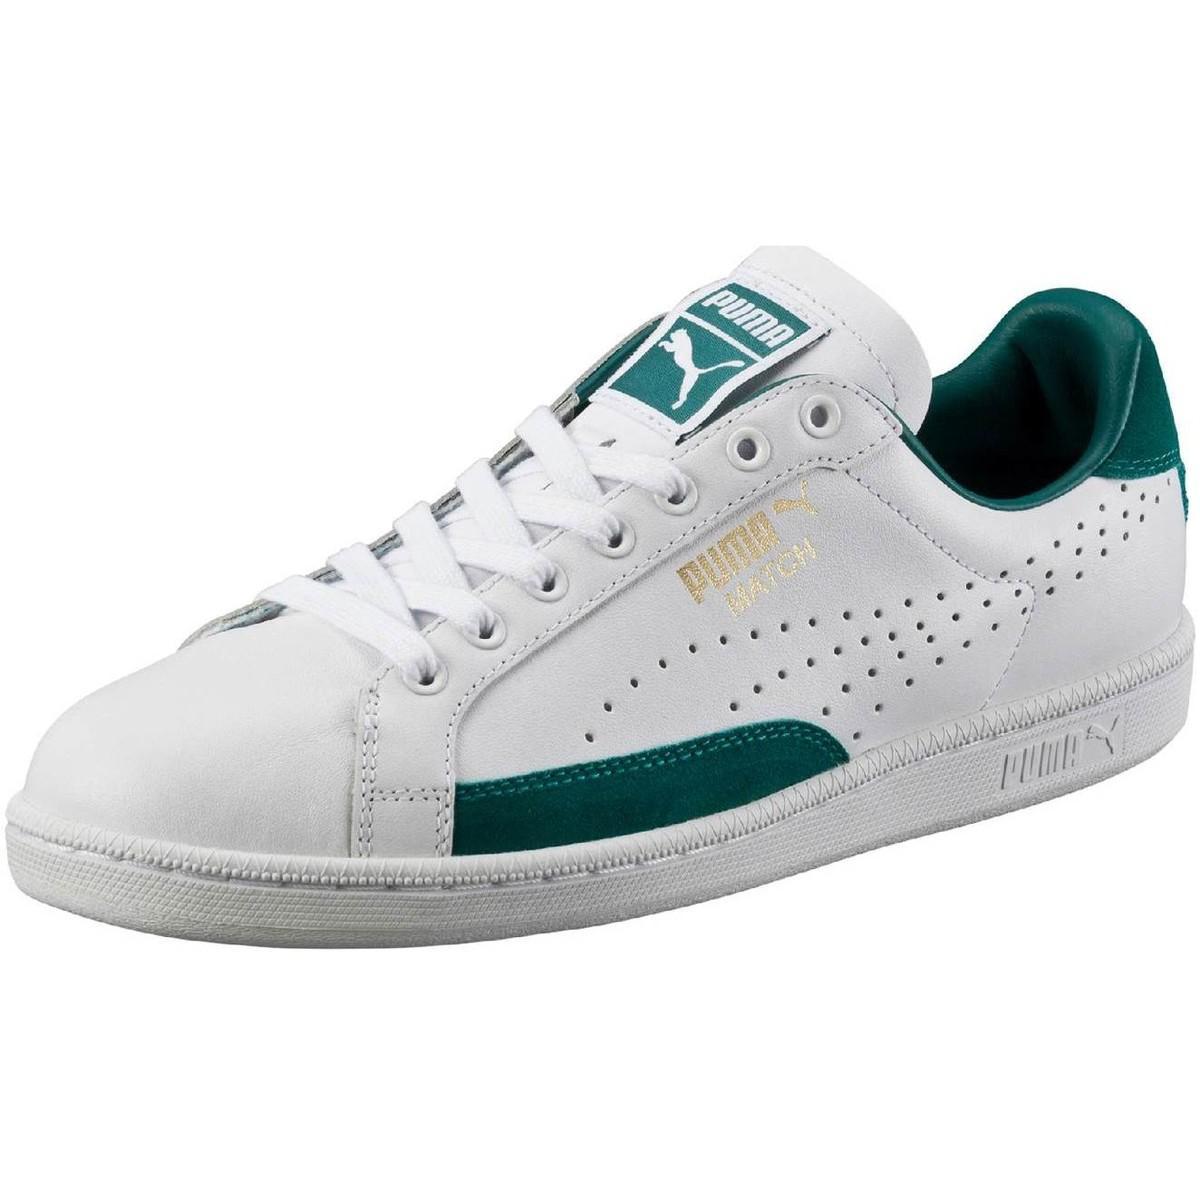 Puma 365601 Sneakers Man Bainco 39 xBfPQk